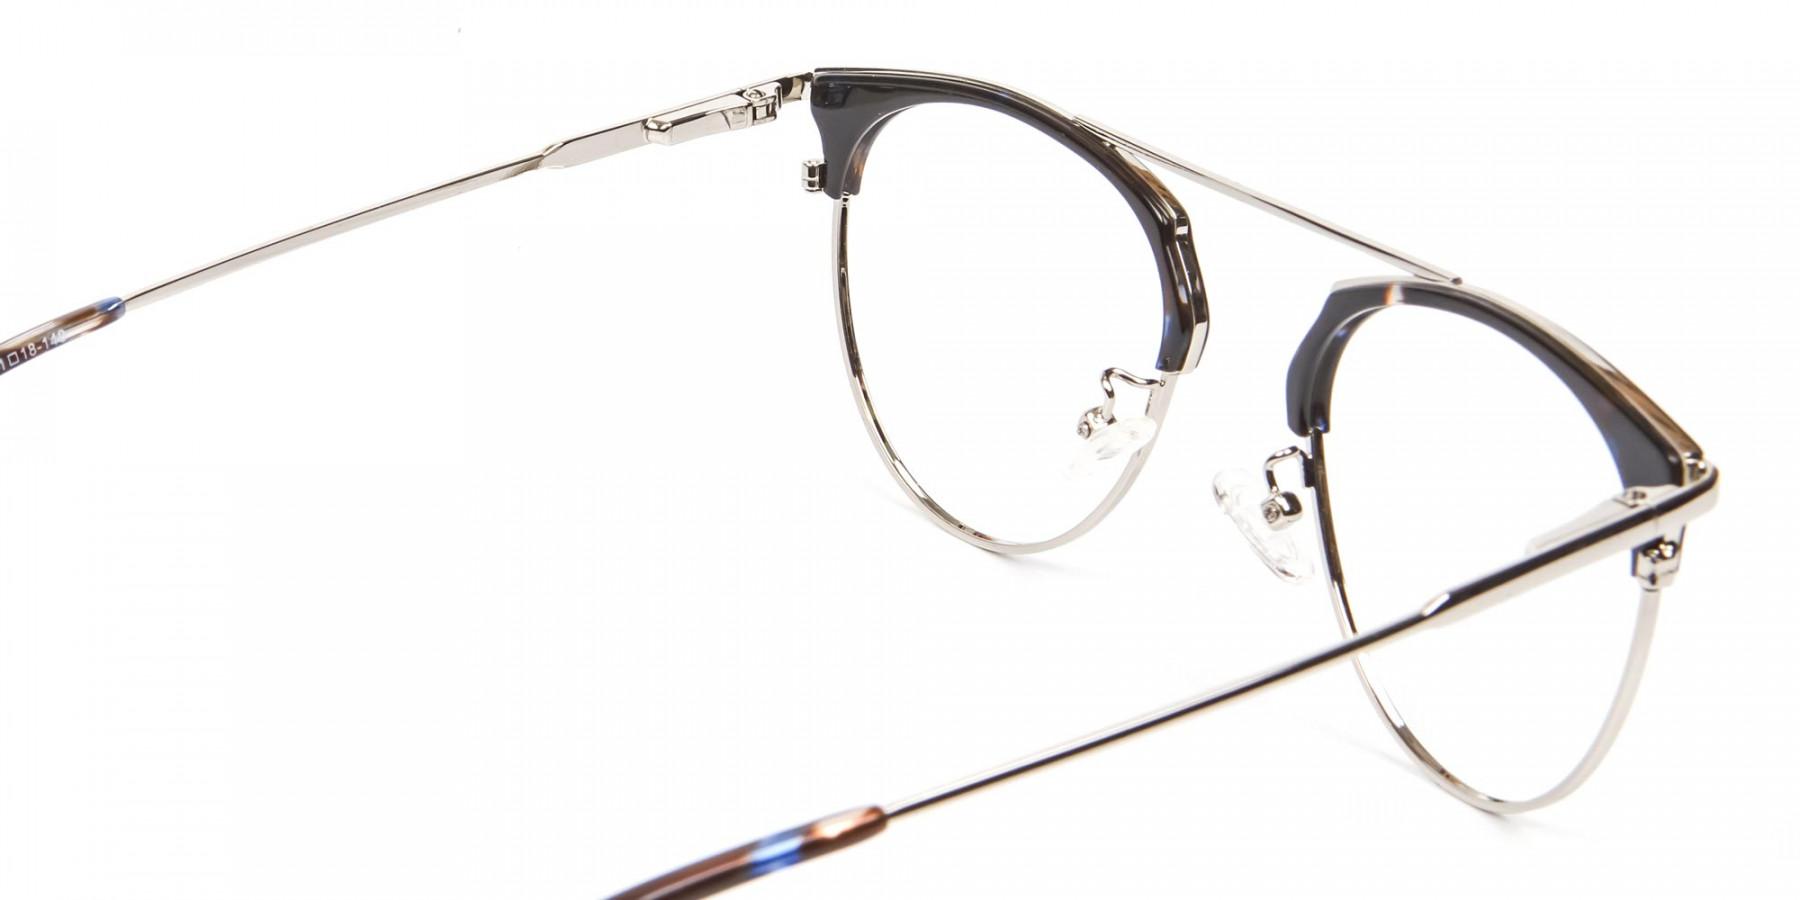 Retro and Modern Designed Glasses - 1